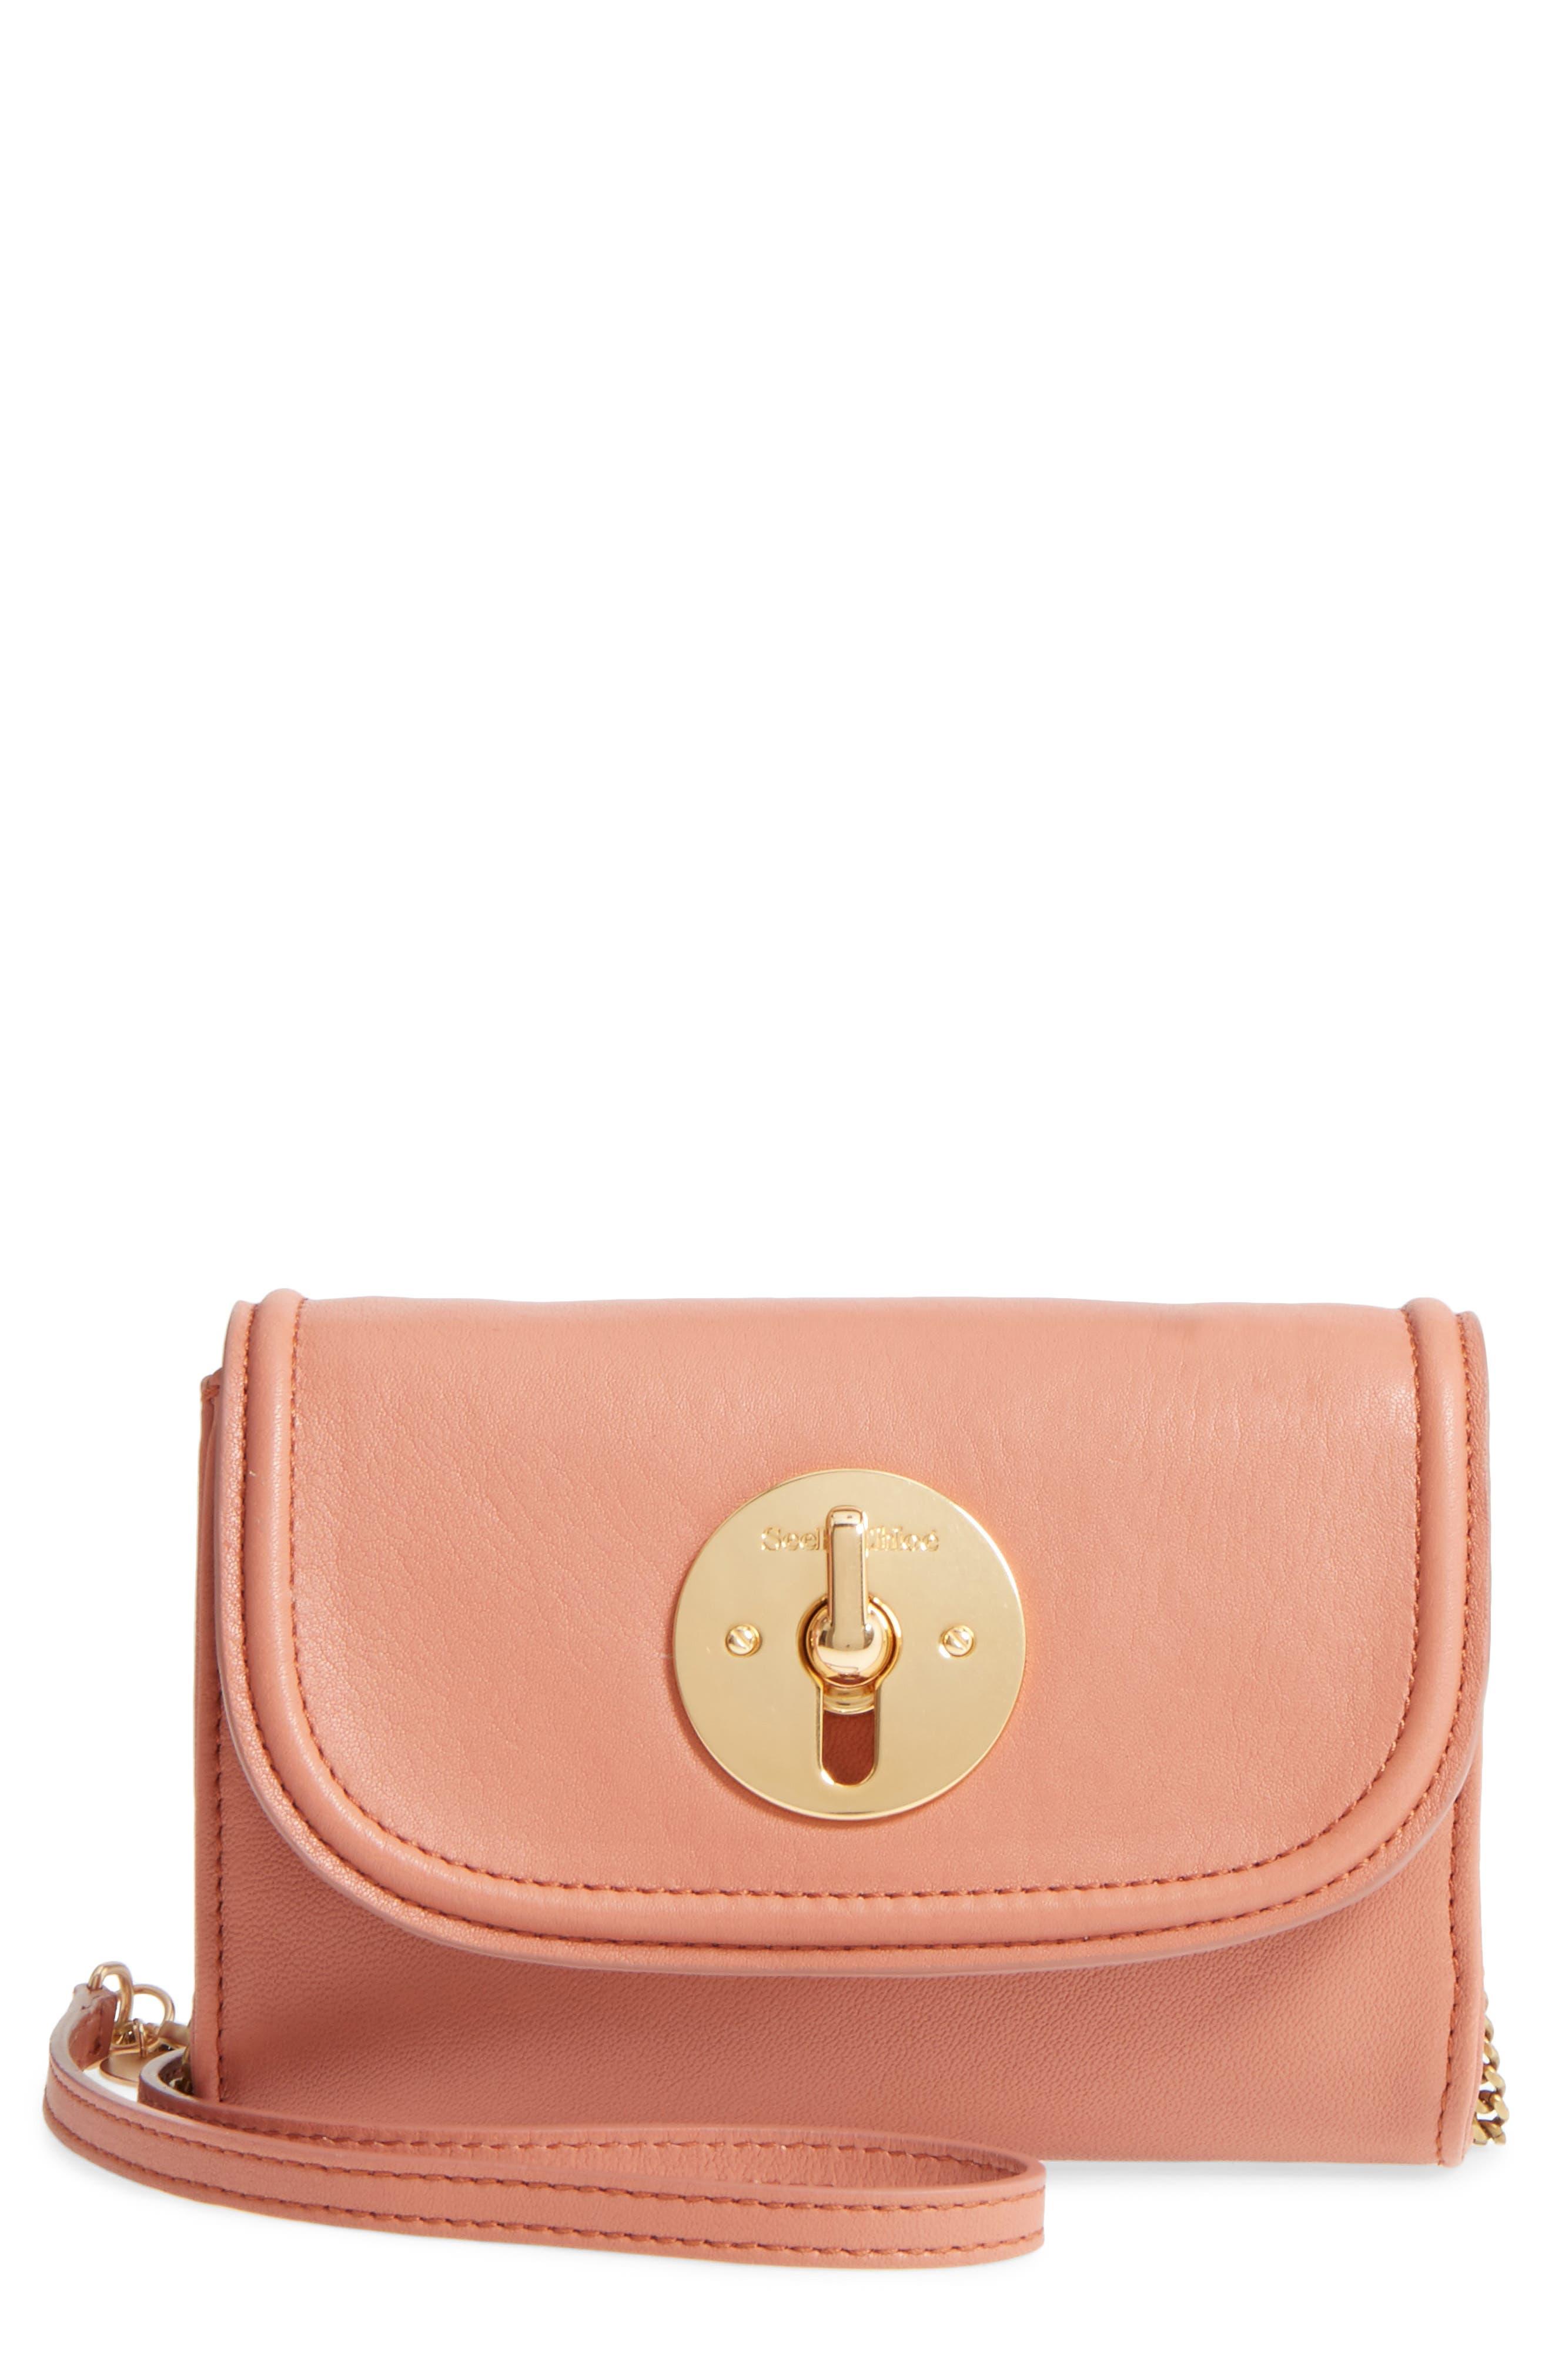 See By Chloe Mini Leather Crossbody Bag - Pink